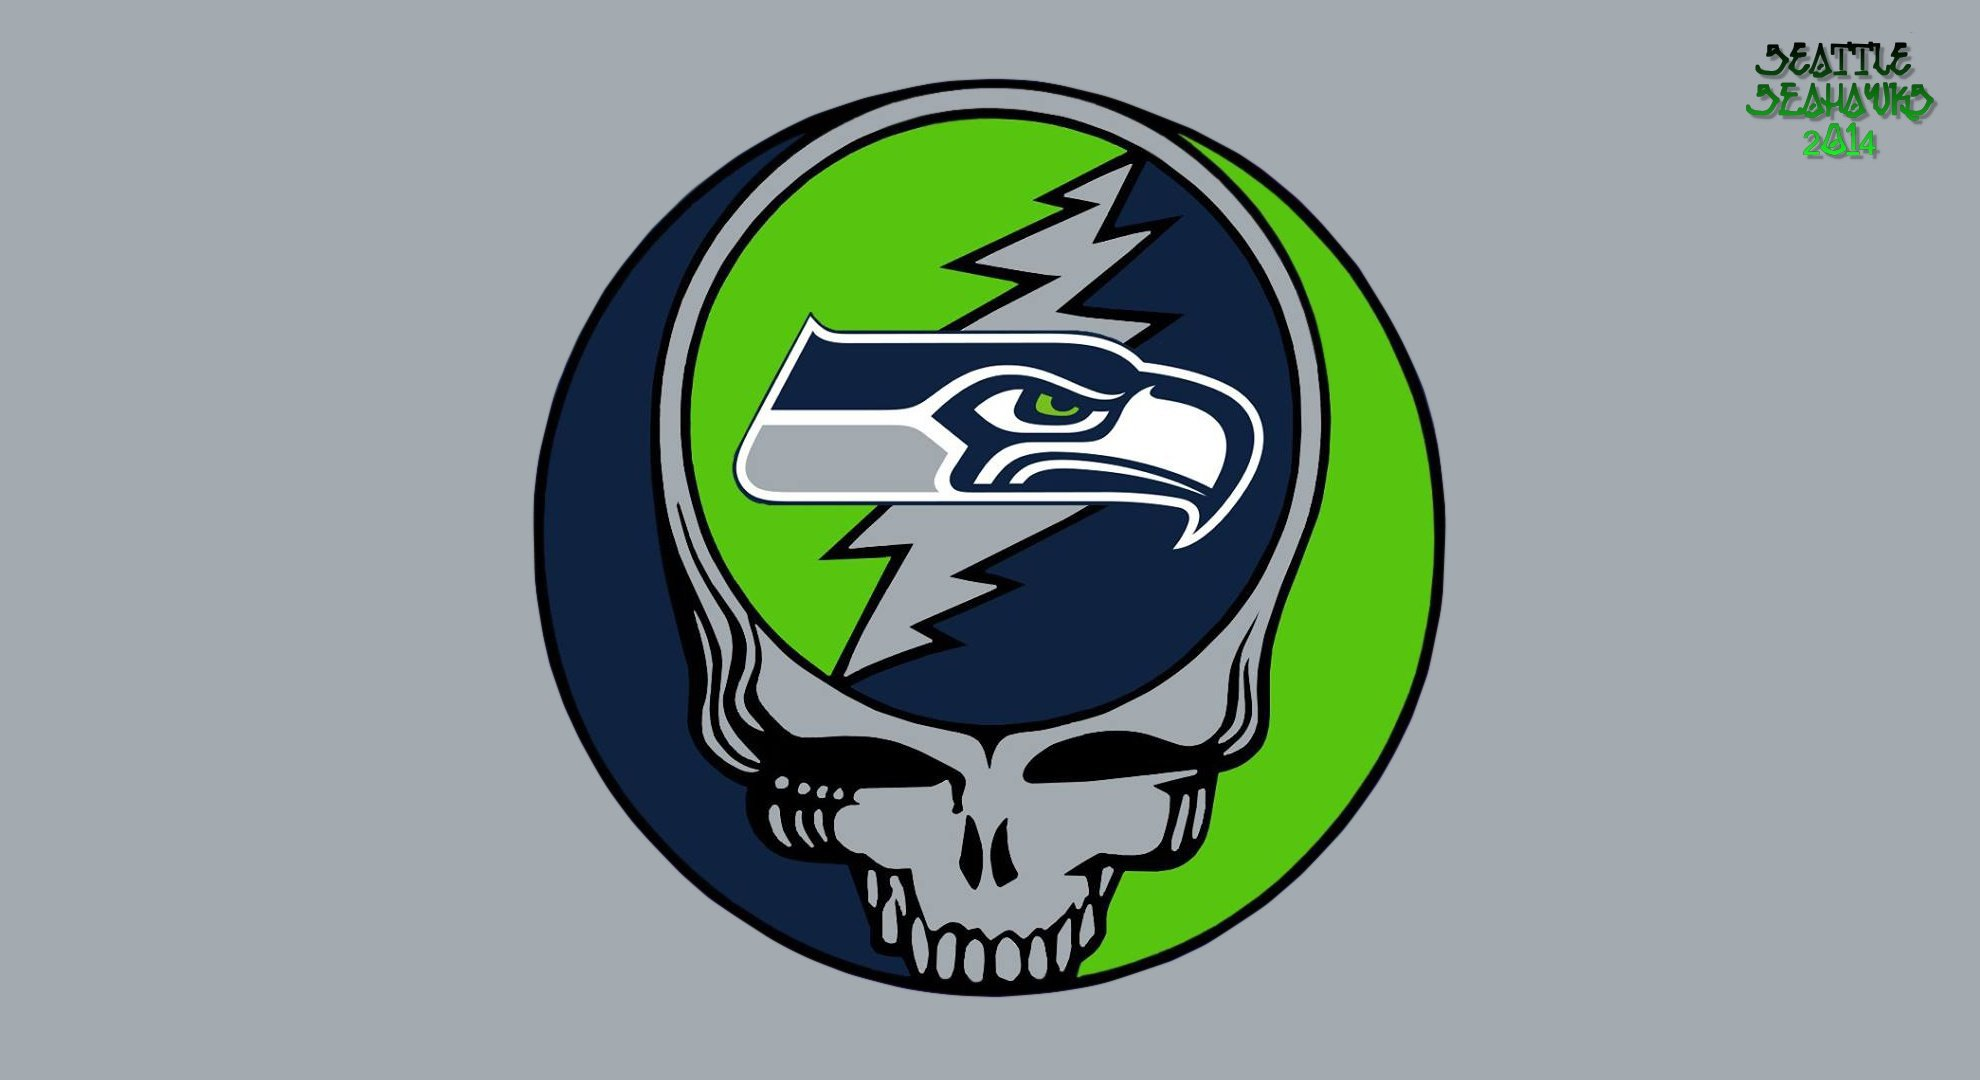 Seattle Seahawks Nfl Football 66 Wallpaper 1980x1080 244180 Wallpaperup